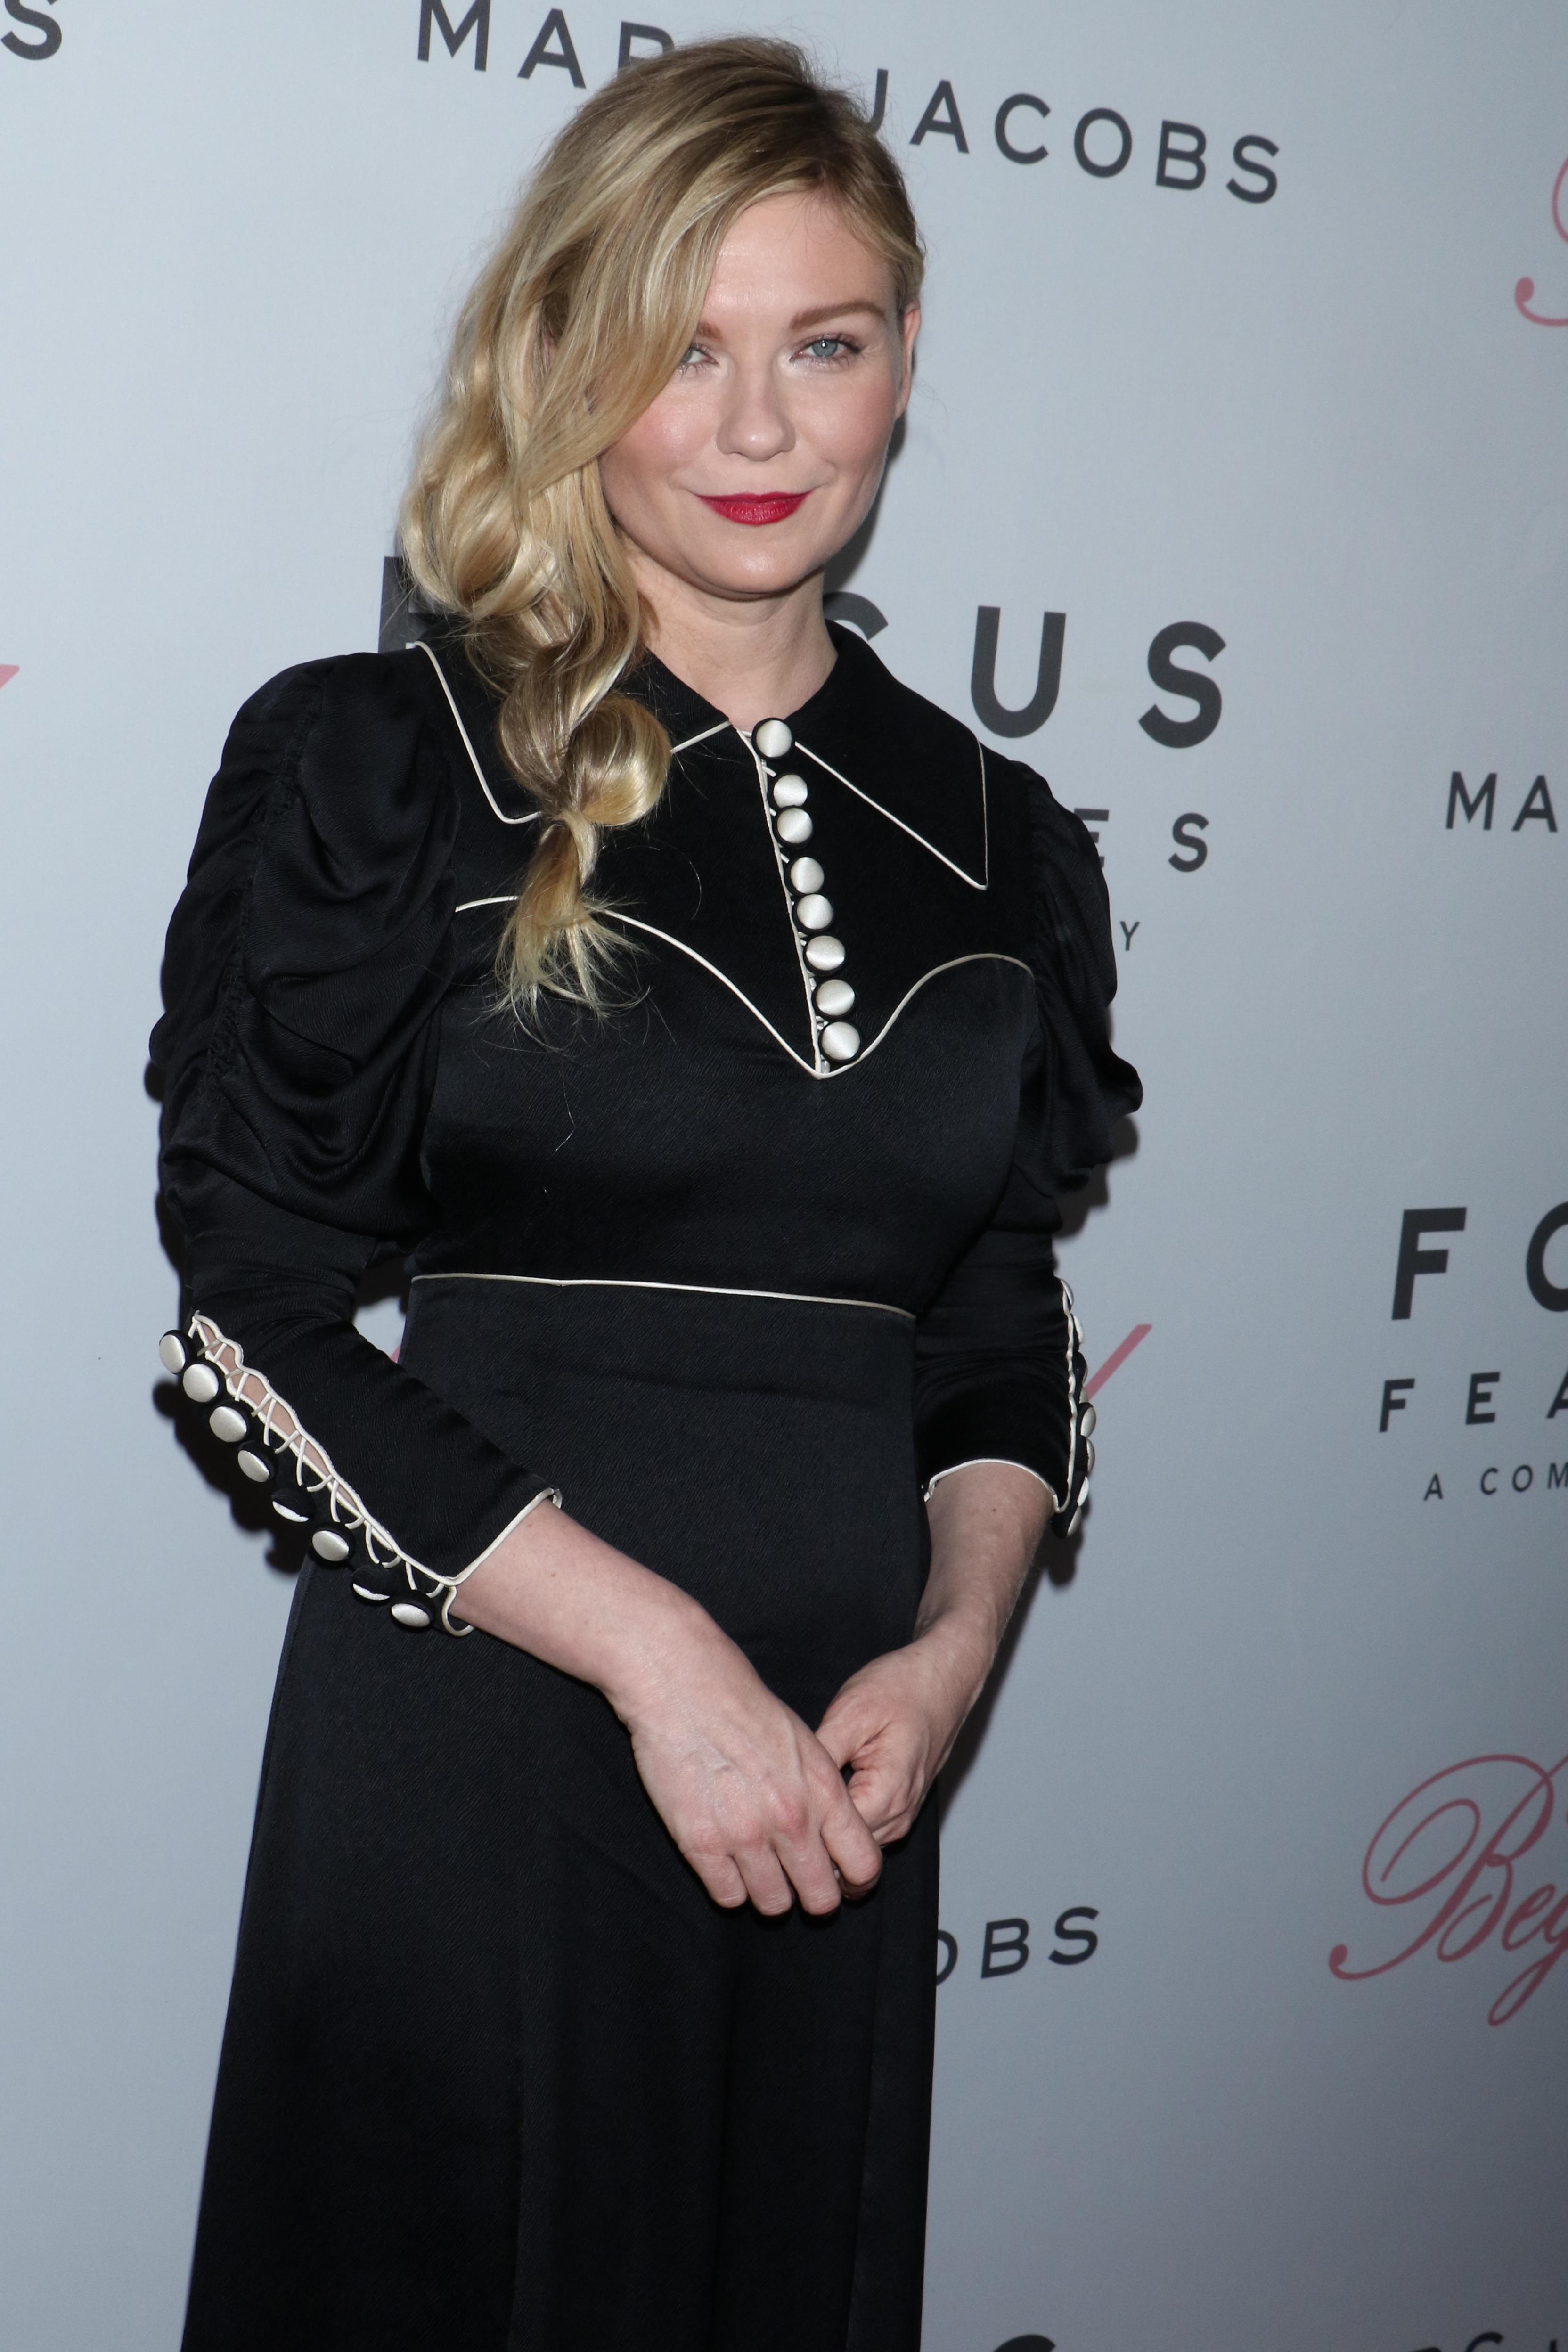 Kirsten Dunst'The Beguiled' film premiere, Arrivals, New York, USA - 22 Jun 2017